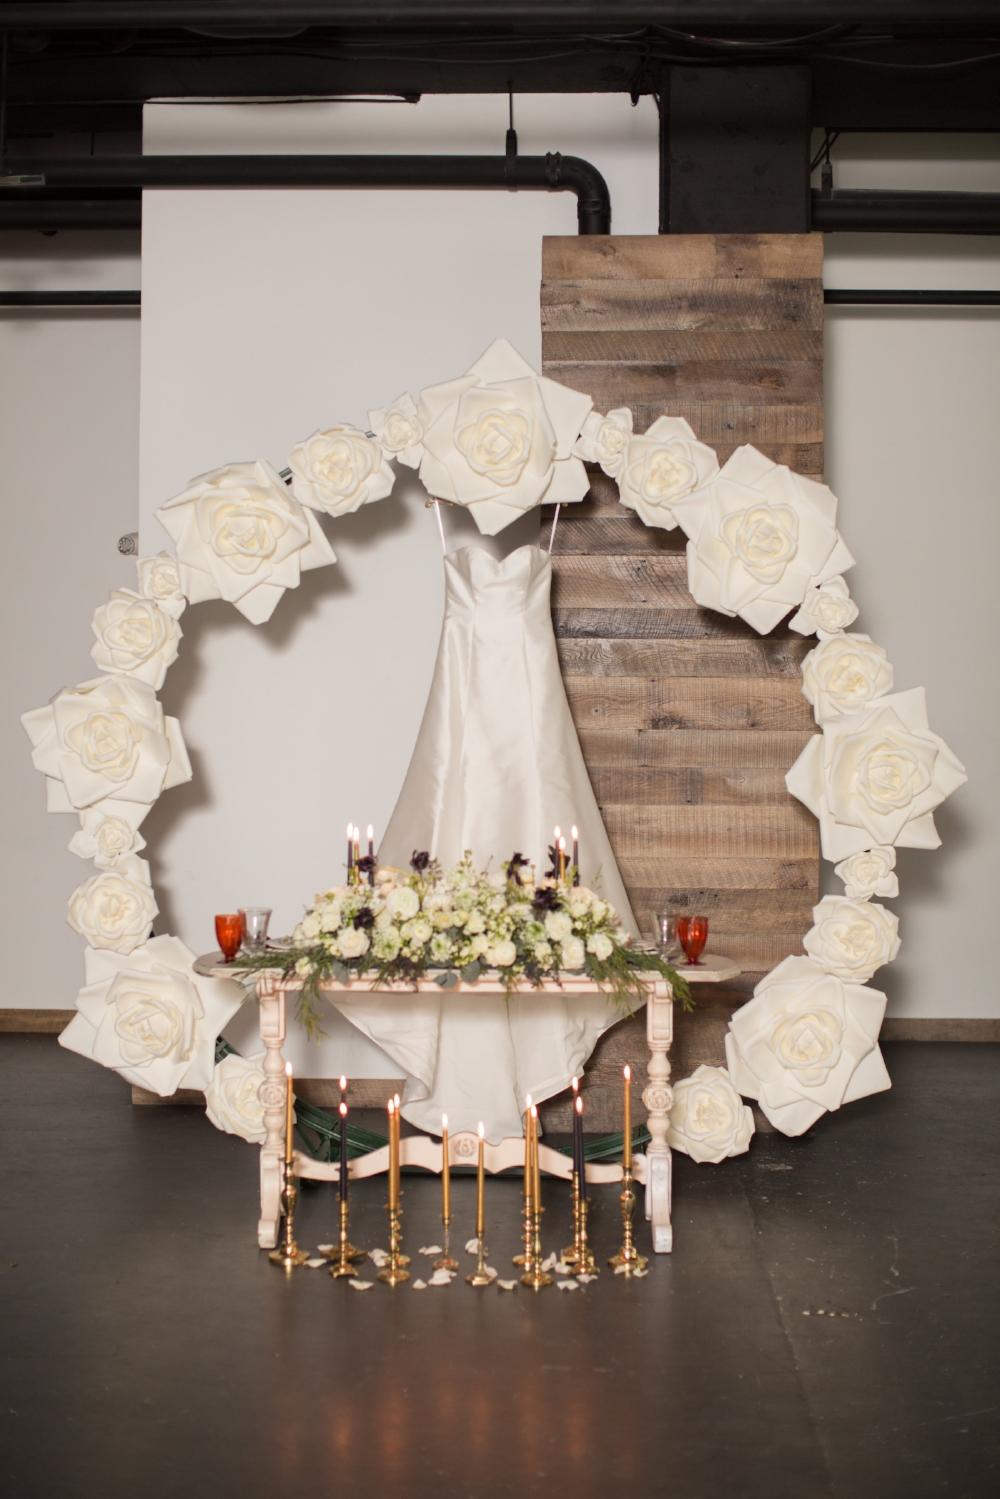 Custom Arch with Silk Flowers -